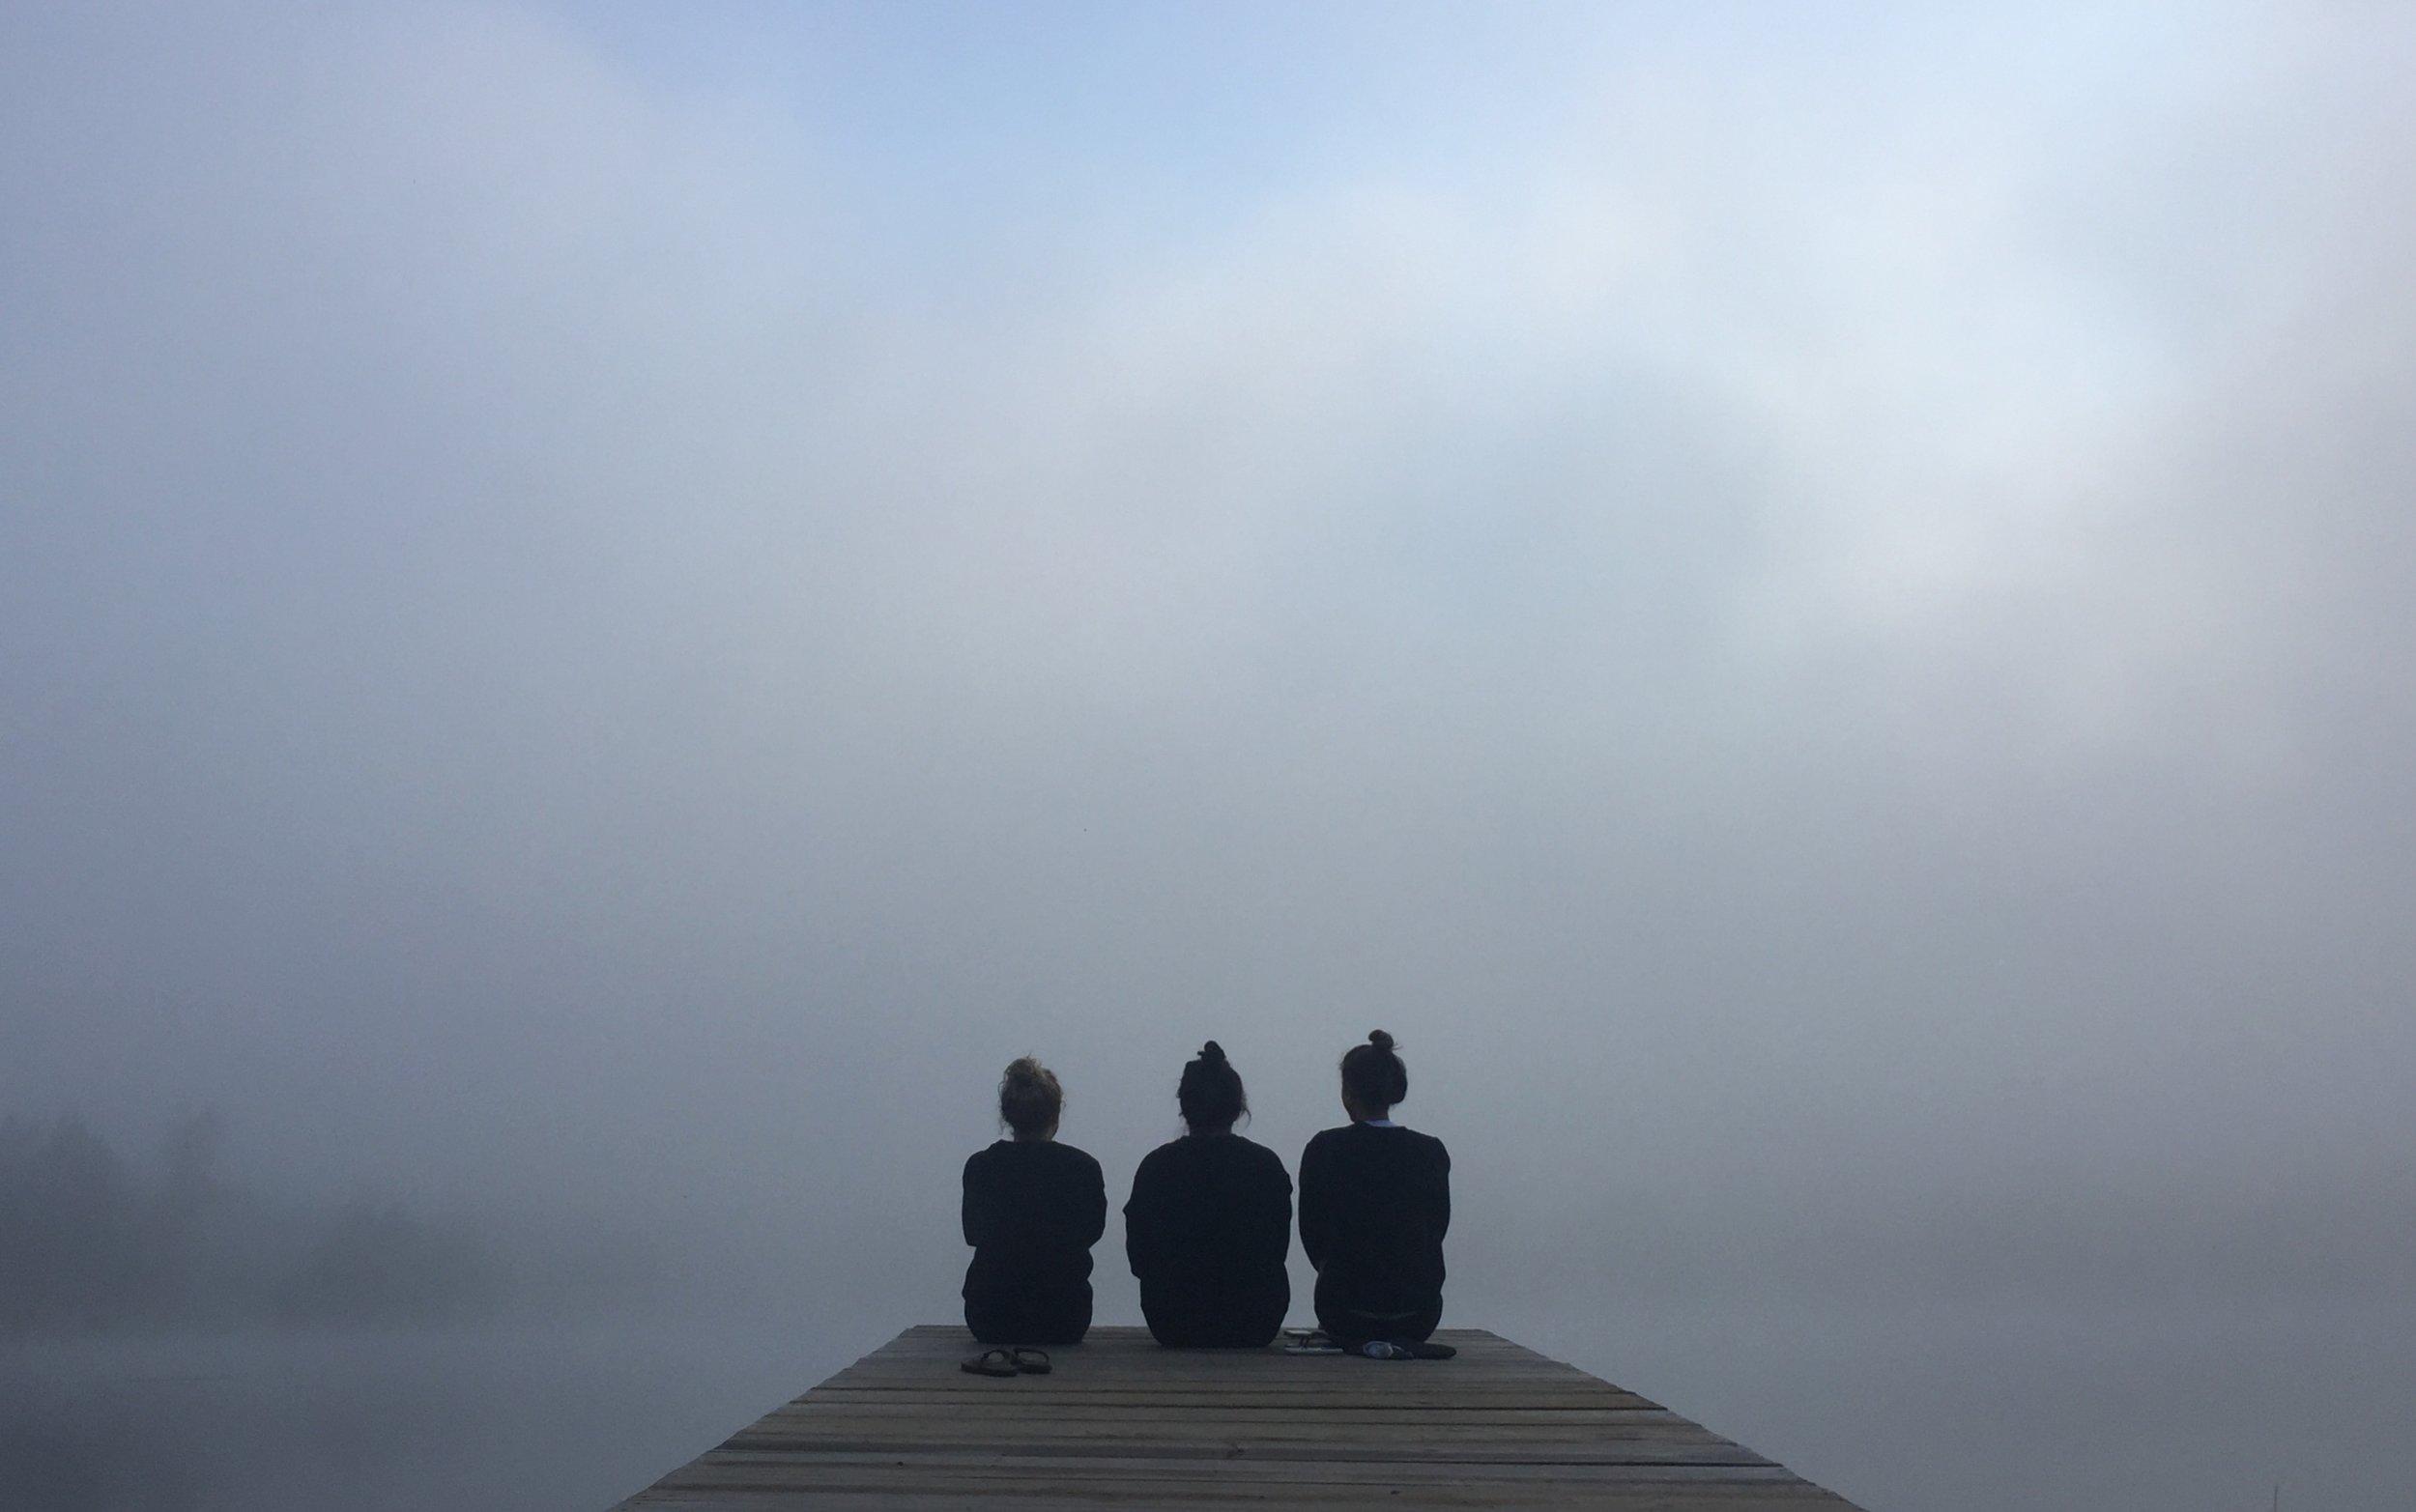 Morning meditation moments.